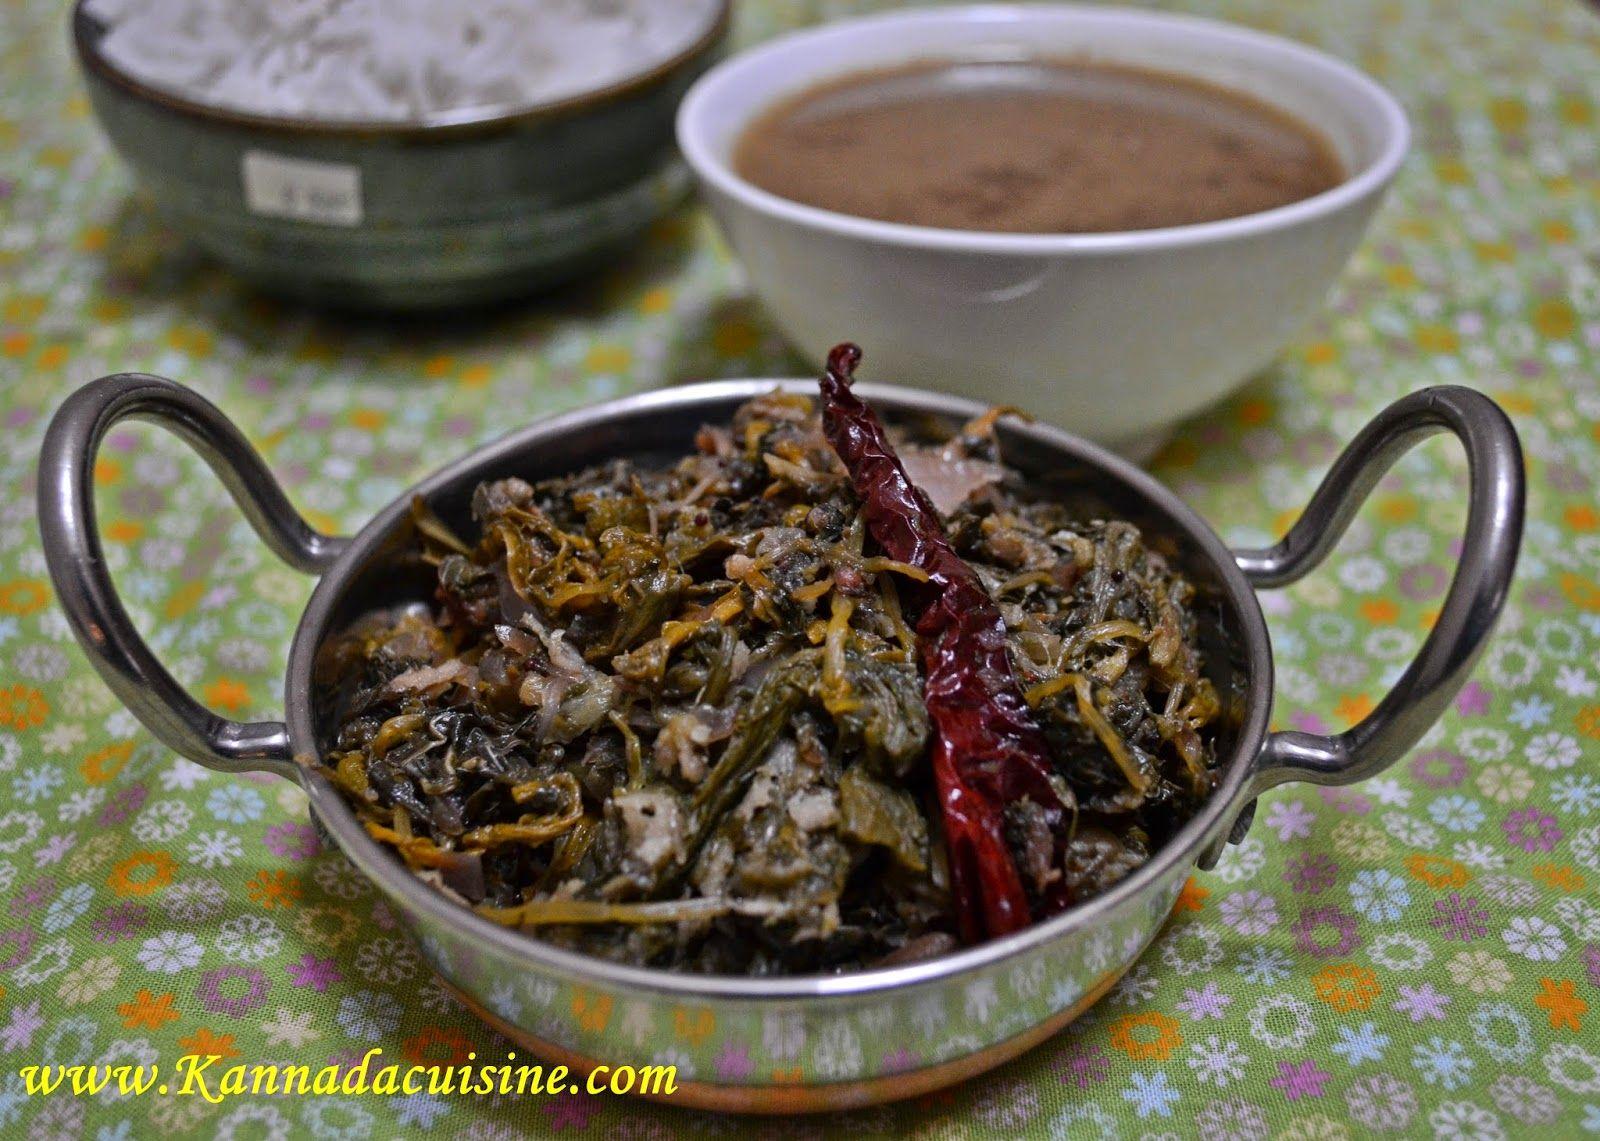 Kannada cuisine bari soppina saaru south indian curries kannada cuisine bari soppina saaru forumfinder Gallery